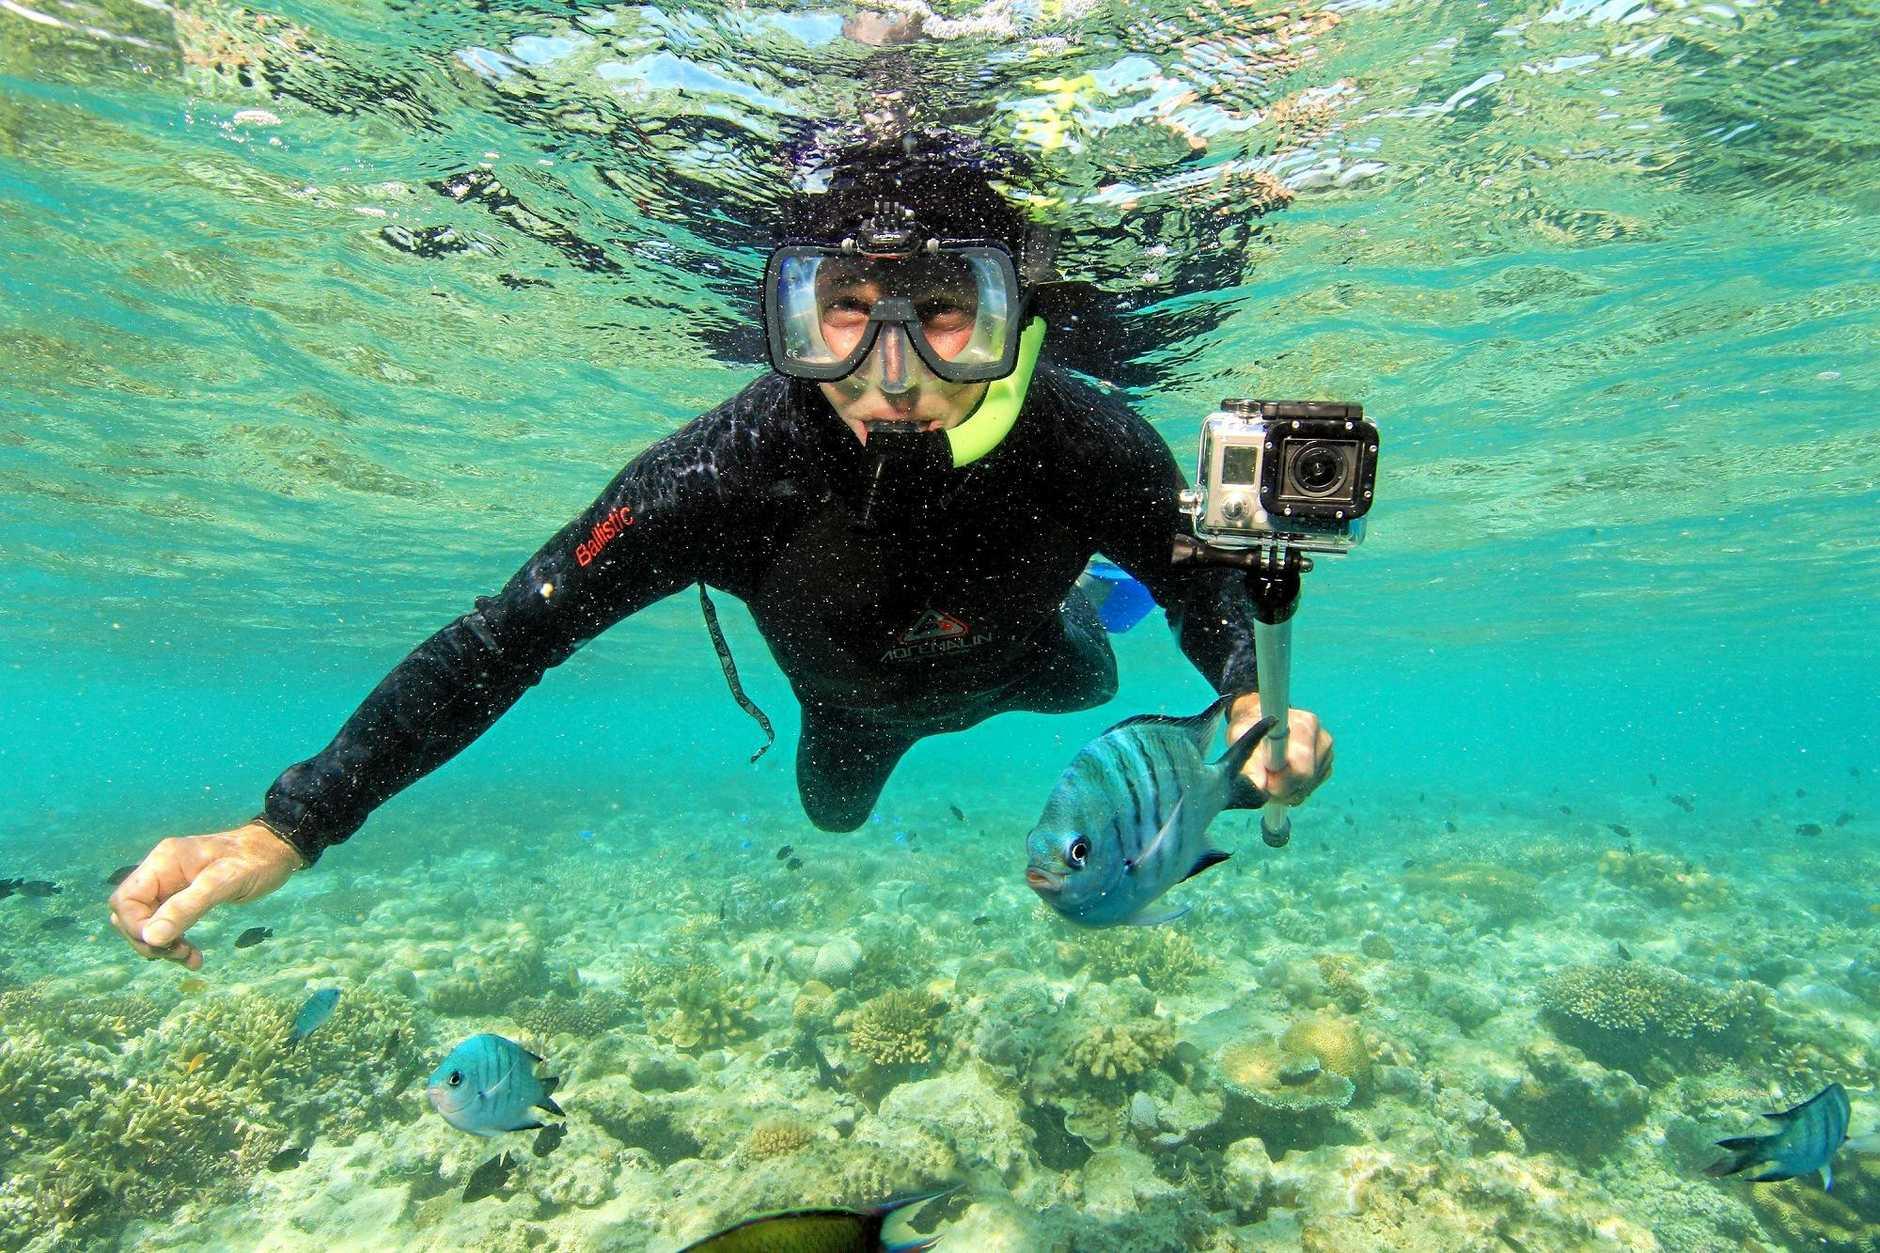 DIVING: Tony Fontes dives deep at Hardy Reef.